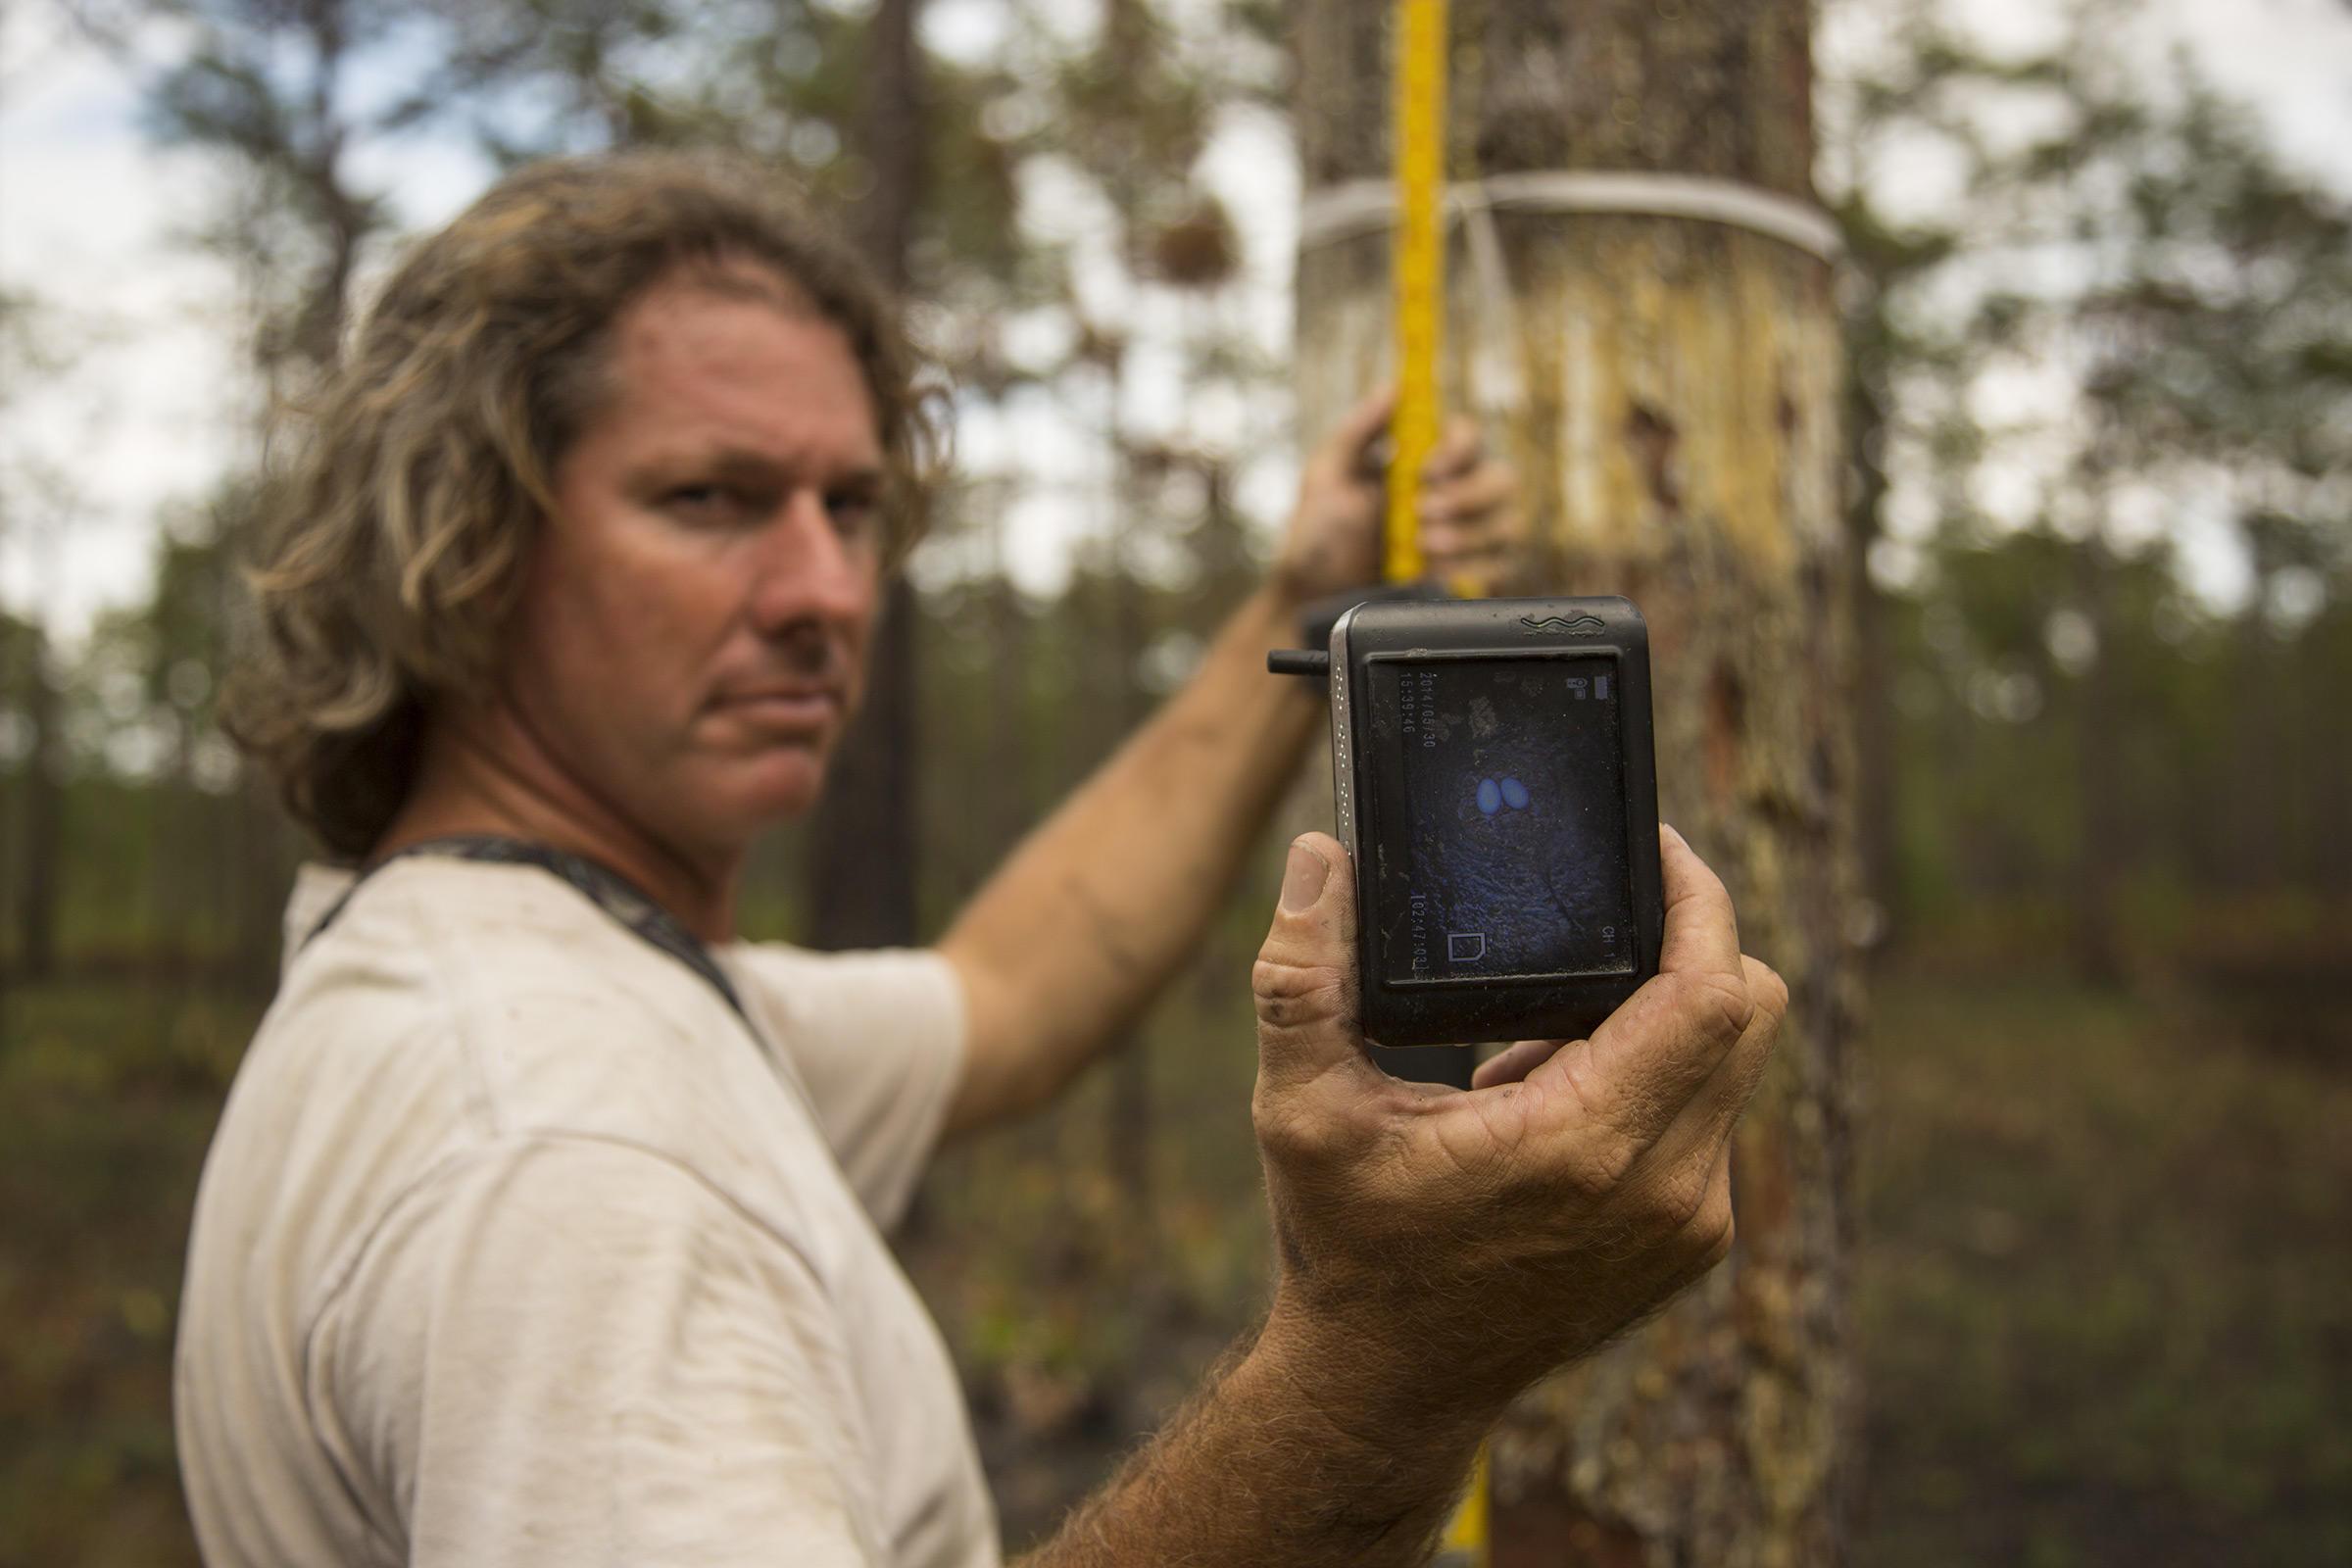 Florida biologist Michael Keys uses a wireless video camera setup designed by Ivory-billed Woodpecker searcher David Luneau. Mac Stone